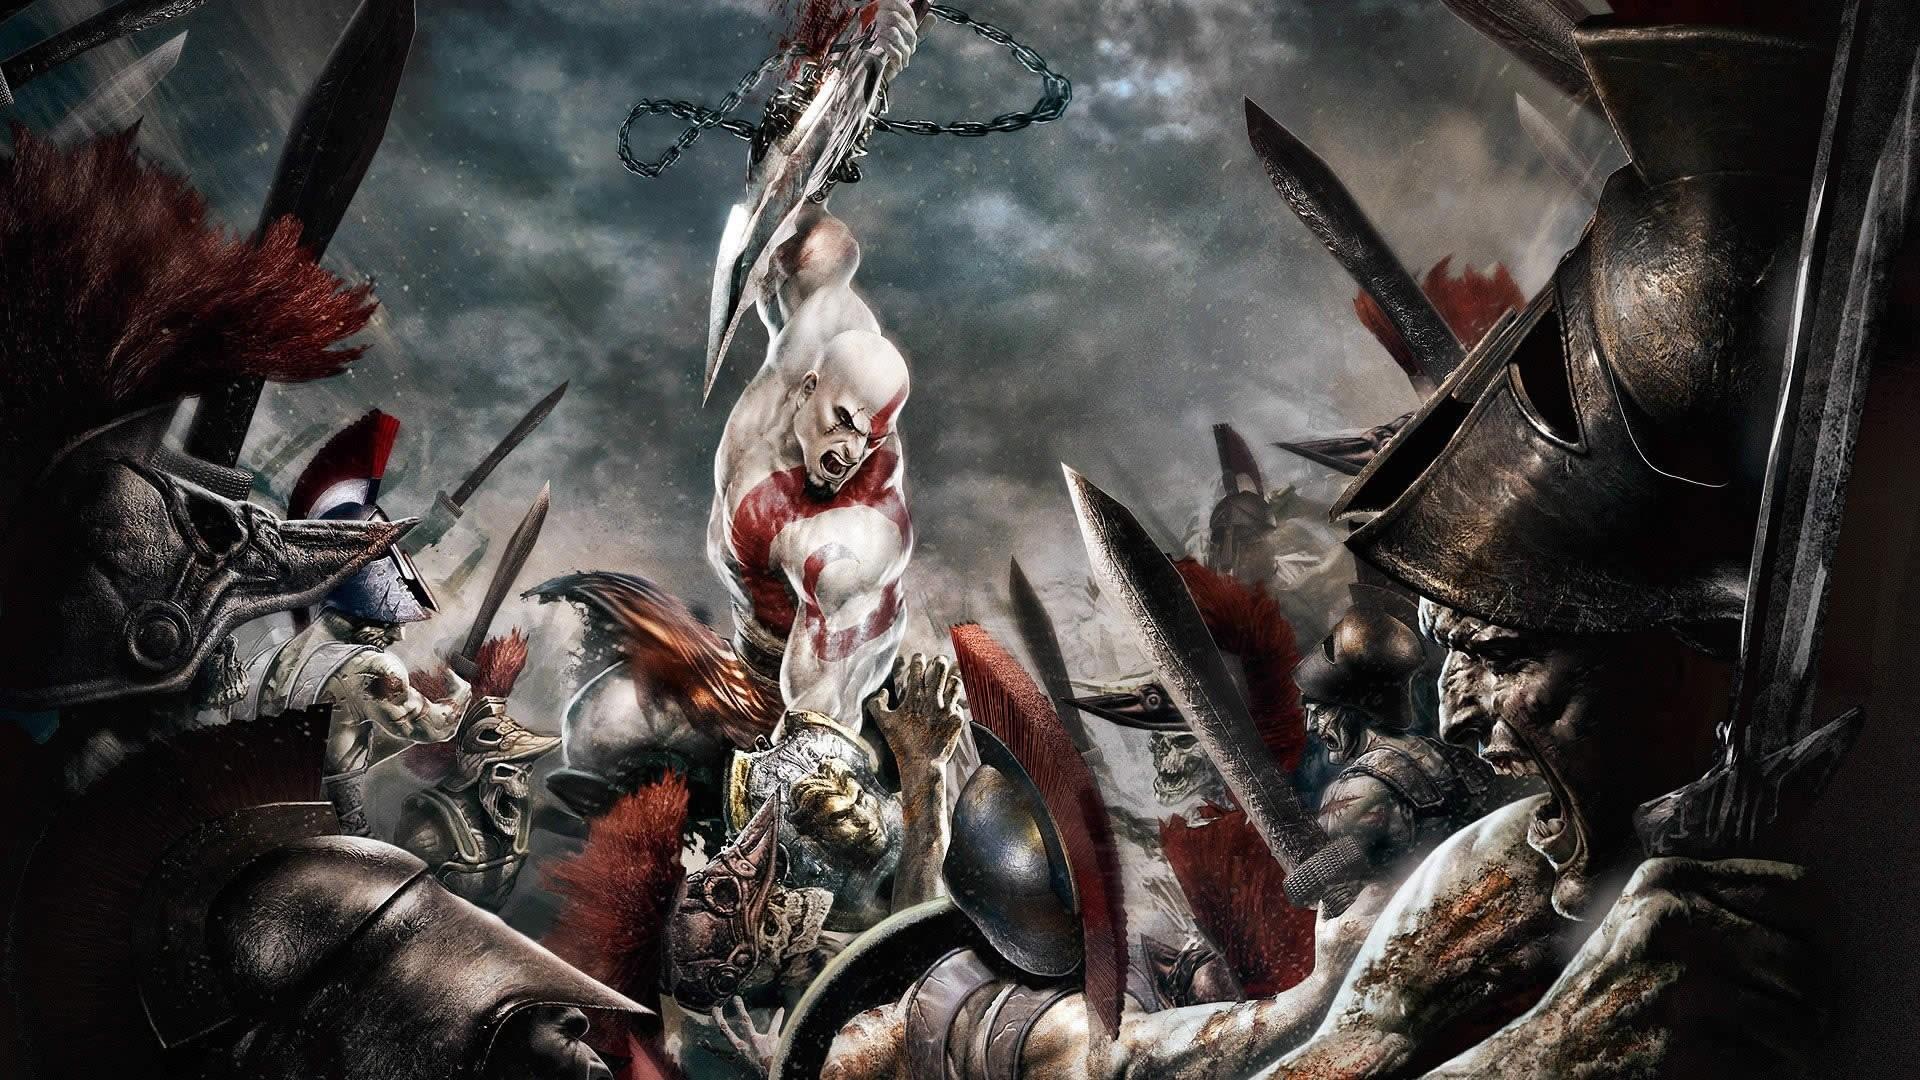 54 God Of War Pap̩is de Parede HD | Planos de Fundo РWallpaper Abyss